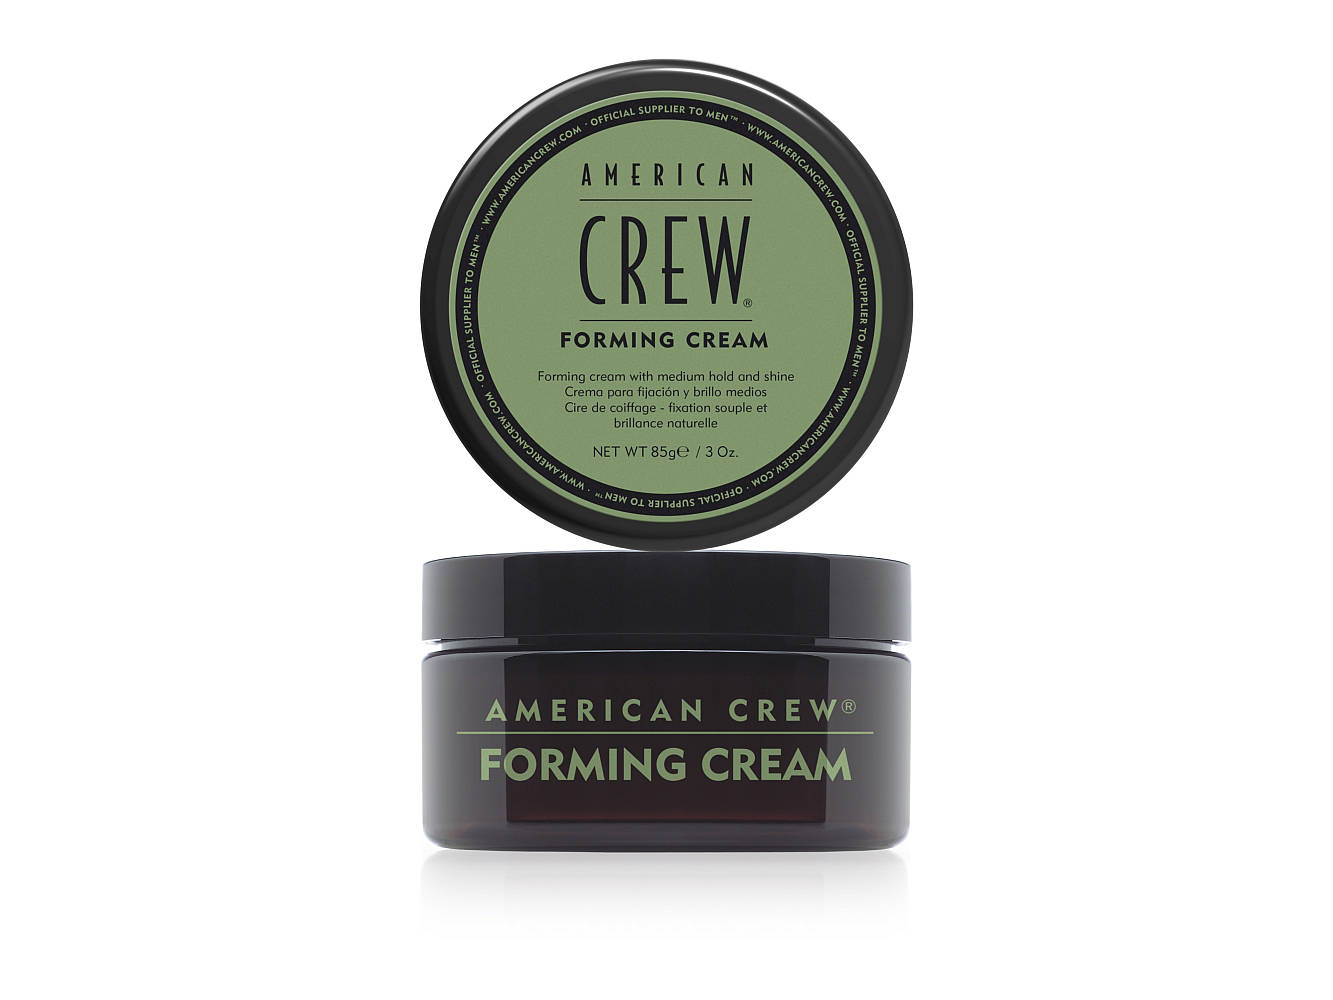 Arma Beauty - American Crew - Forming Cream